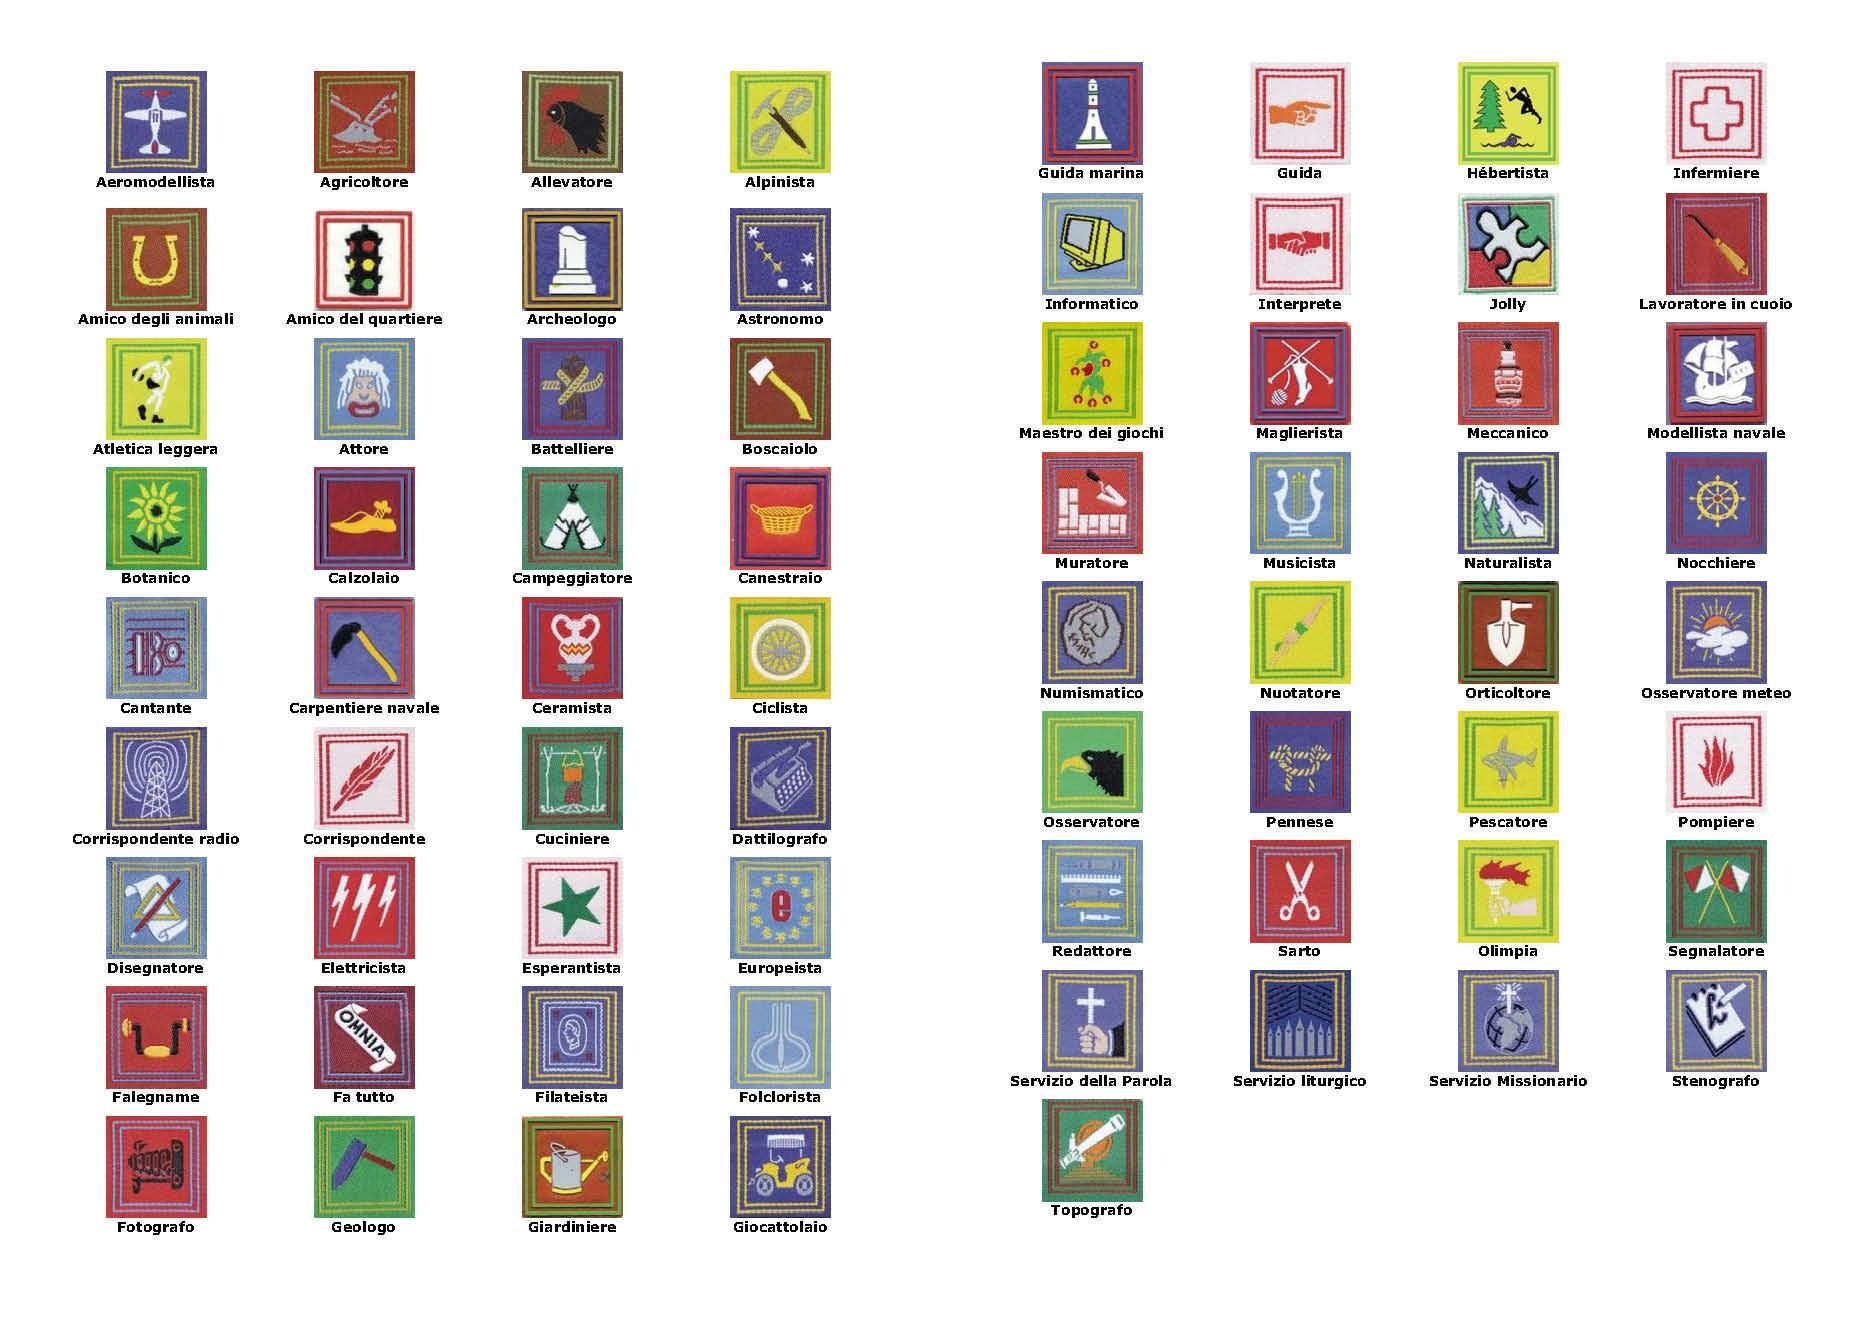 cerotto distintivo per boy scout    dharamerve.gq 8873538b6fd8d